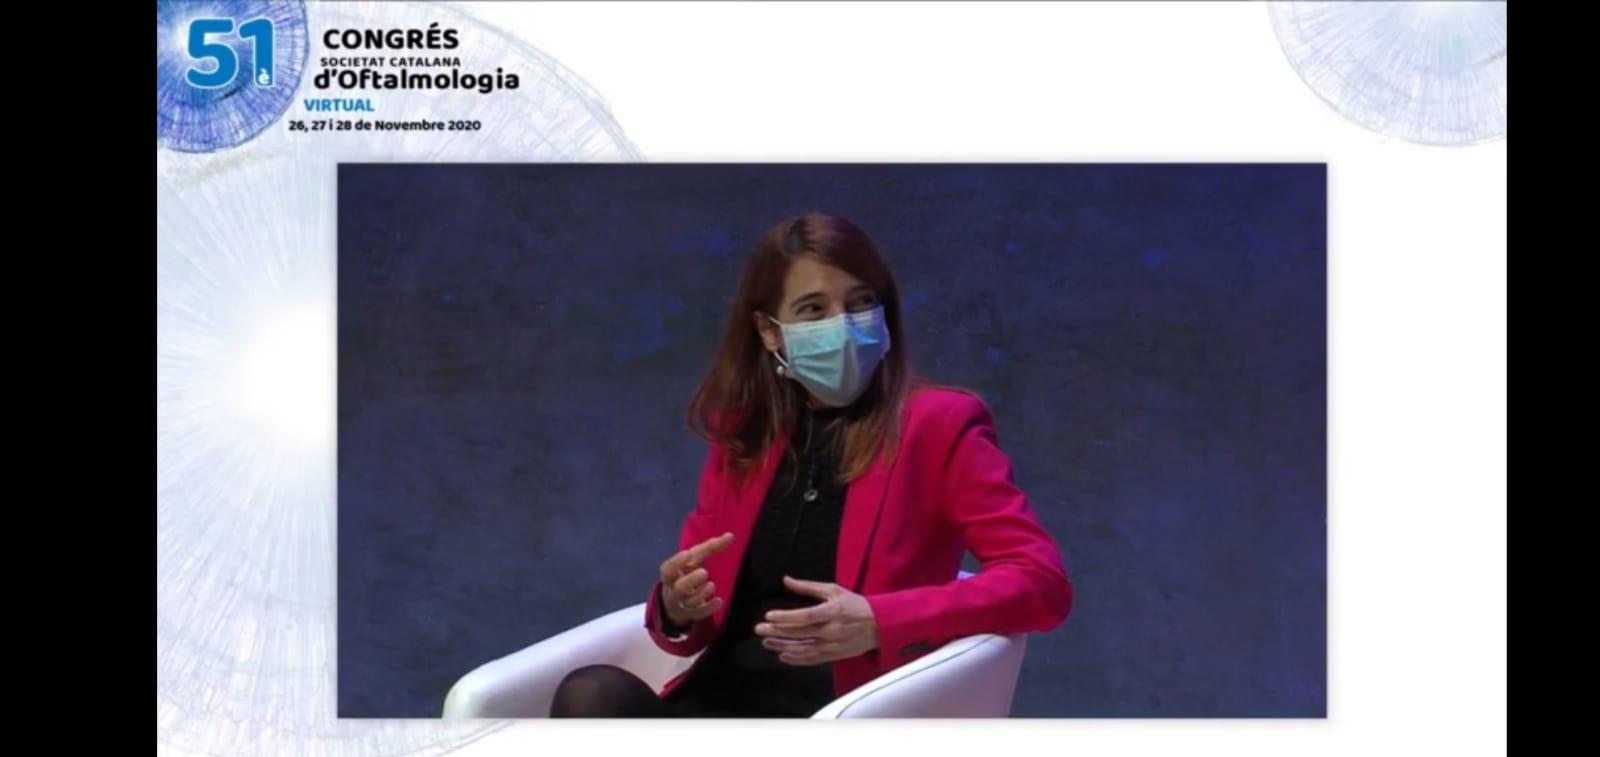 La Dra. Sabater participa en el 51 congreso de la Societat Catalana d'Oftalmologia